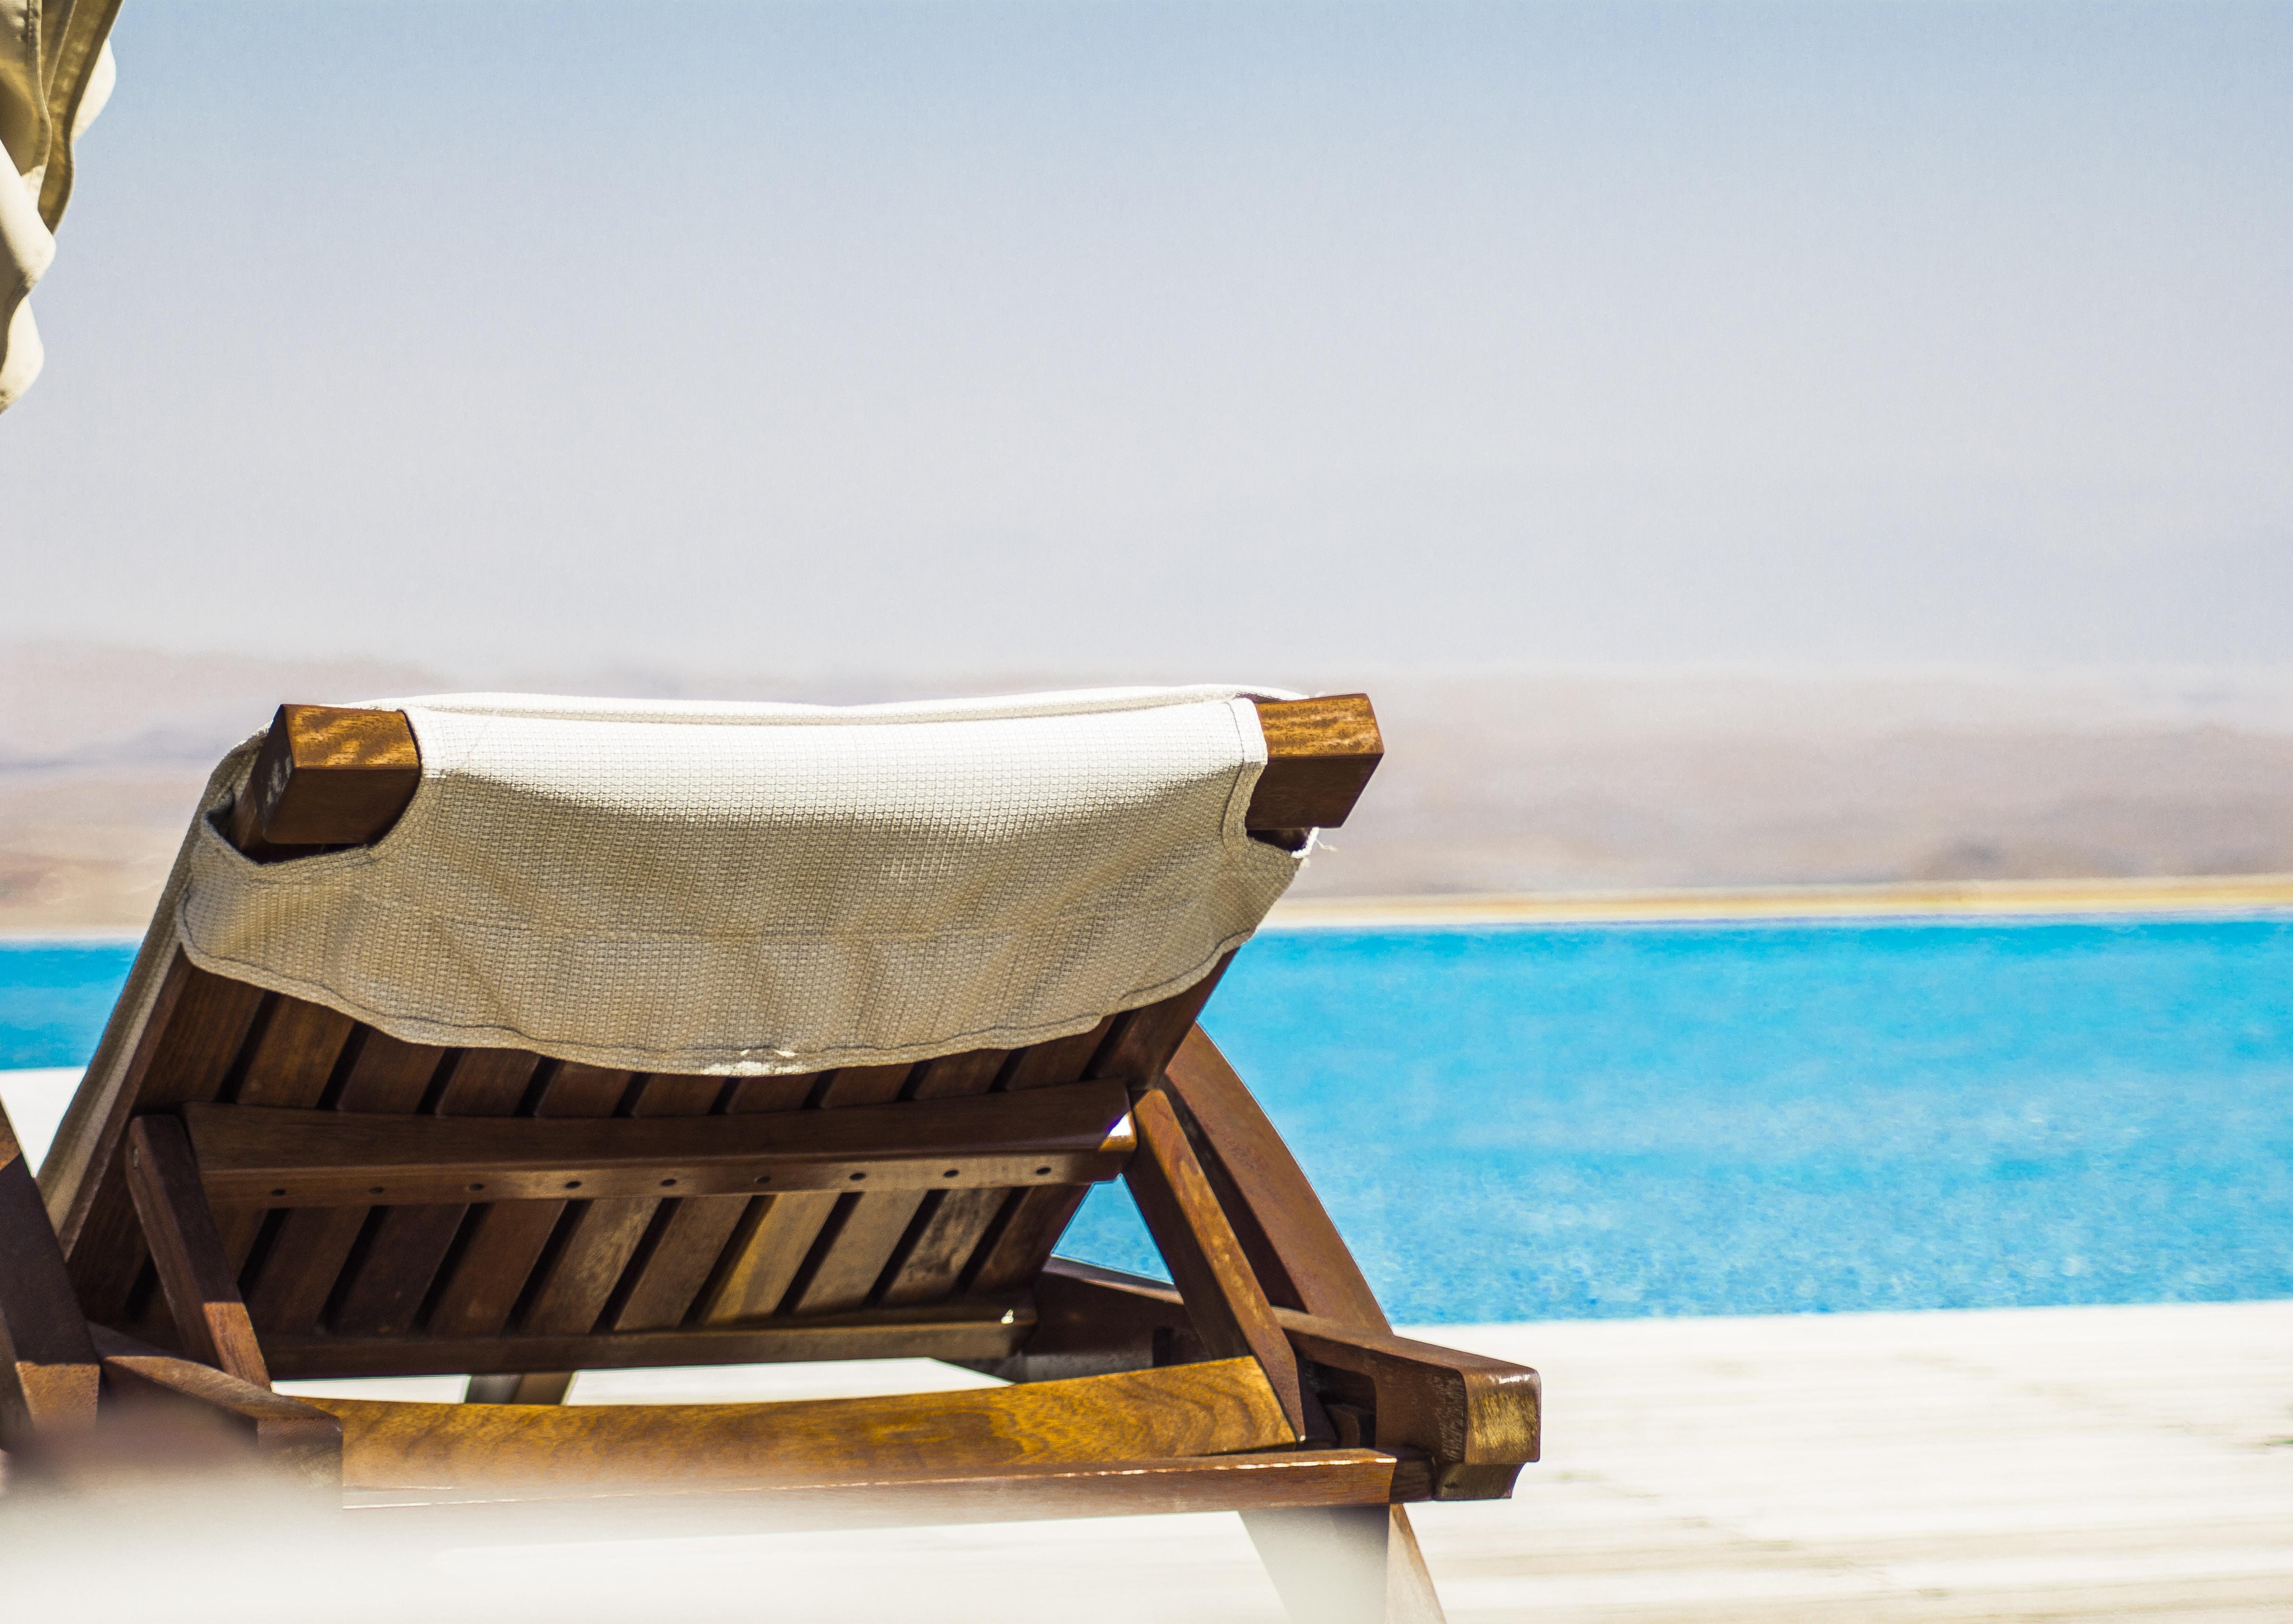 brown wooden lounger on seashore facing ocean